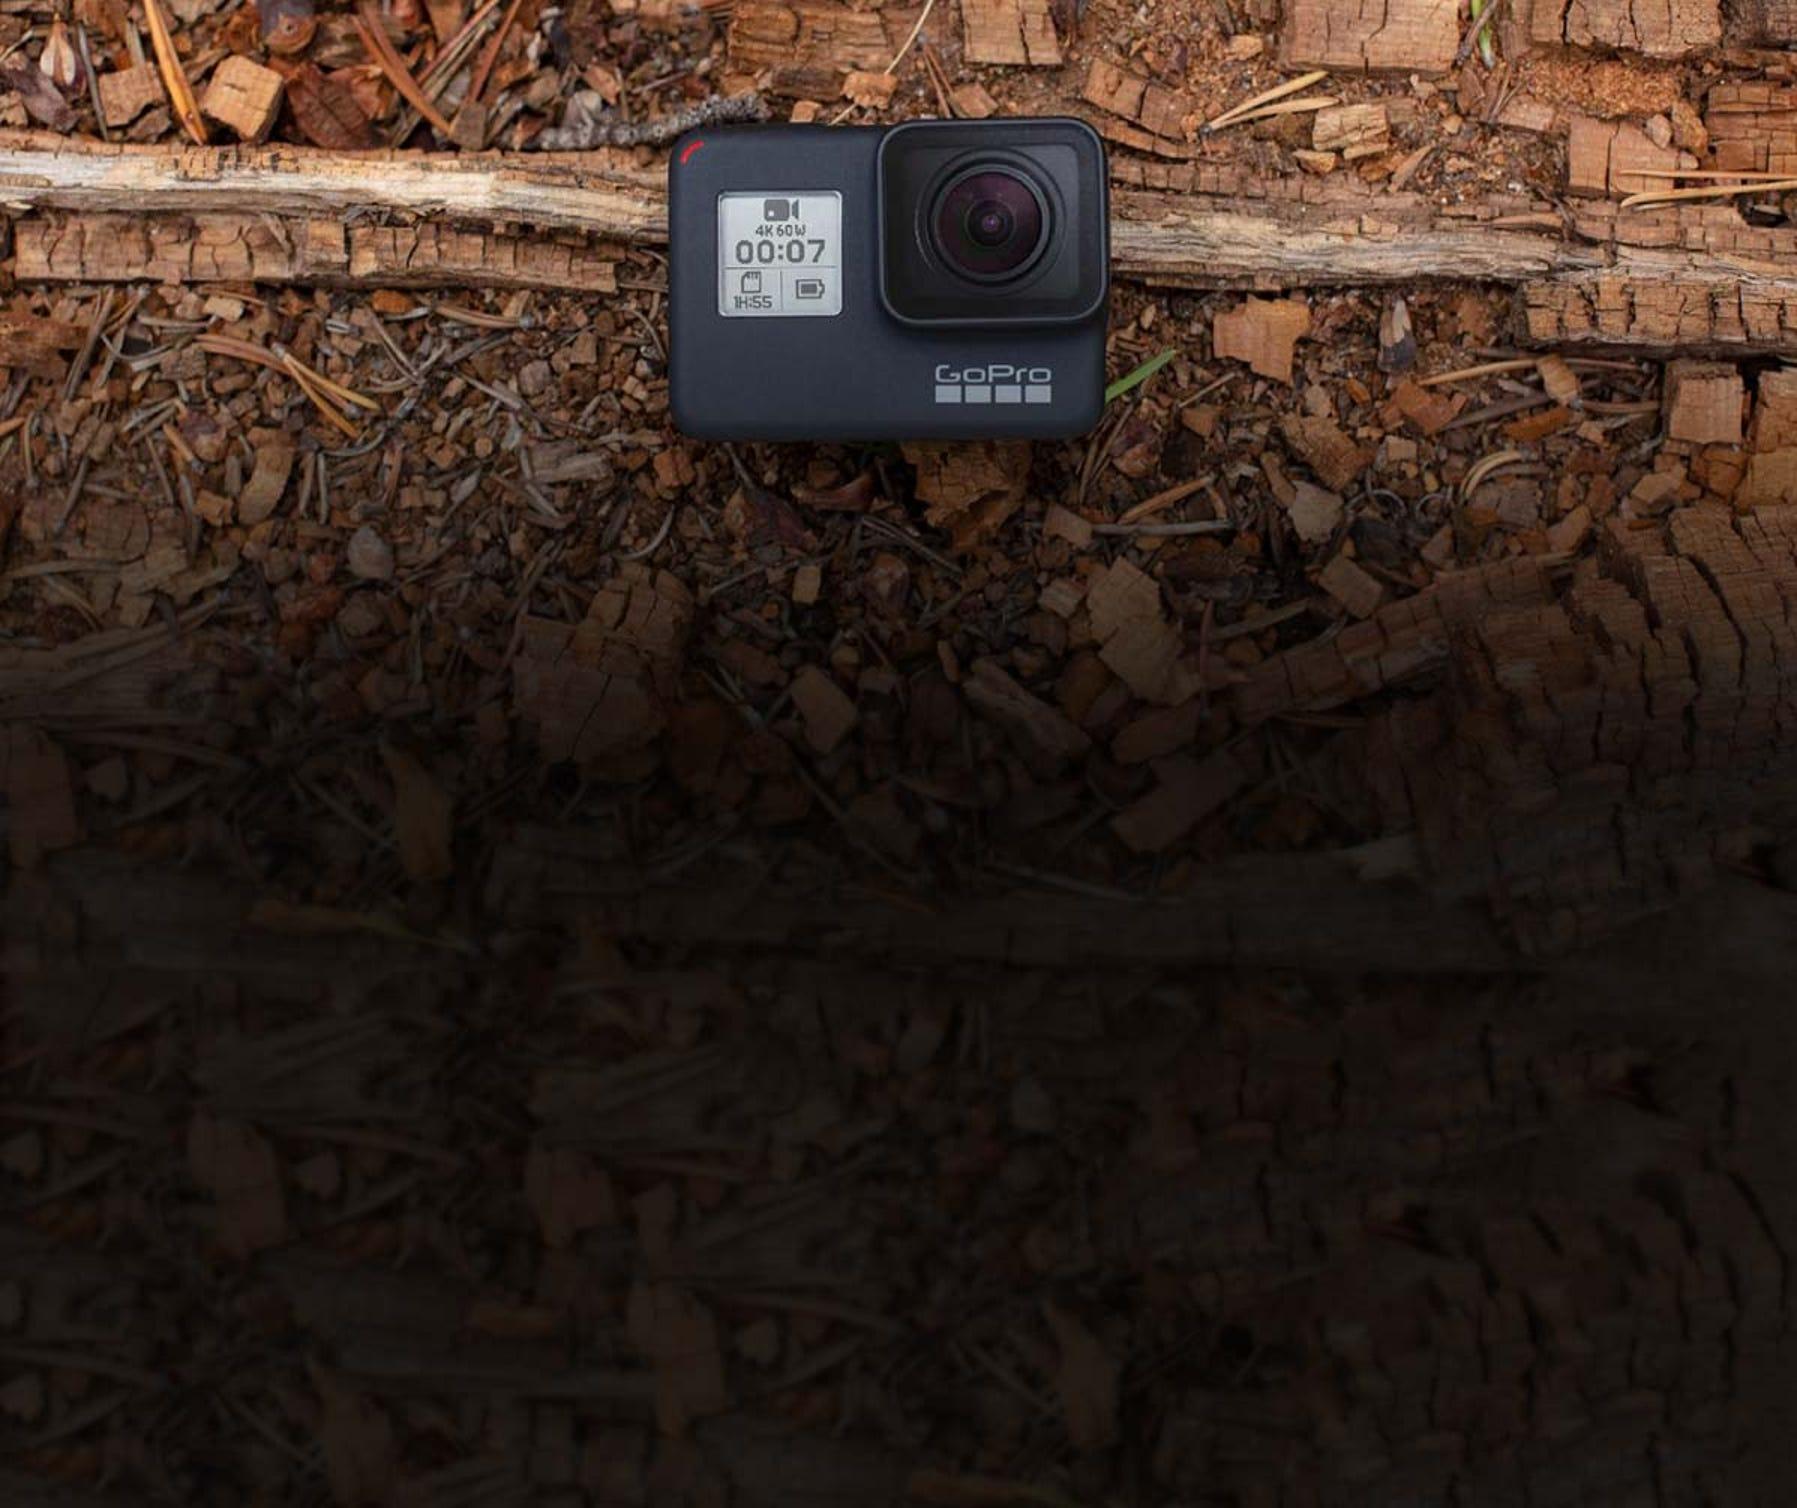 GoPro: Camera, Video, Selfie Stick & Accessories | Best Buy